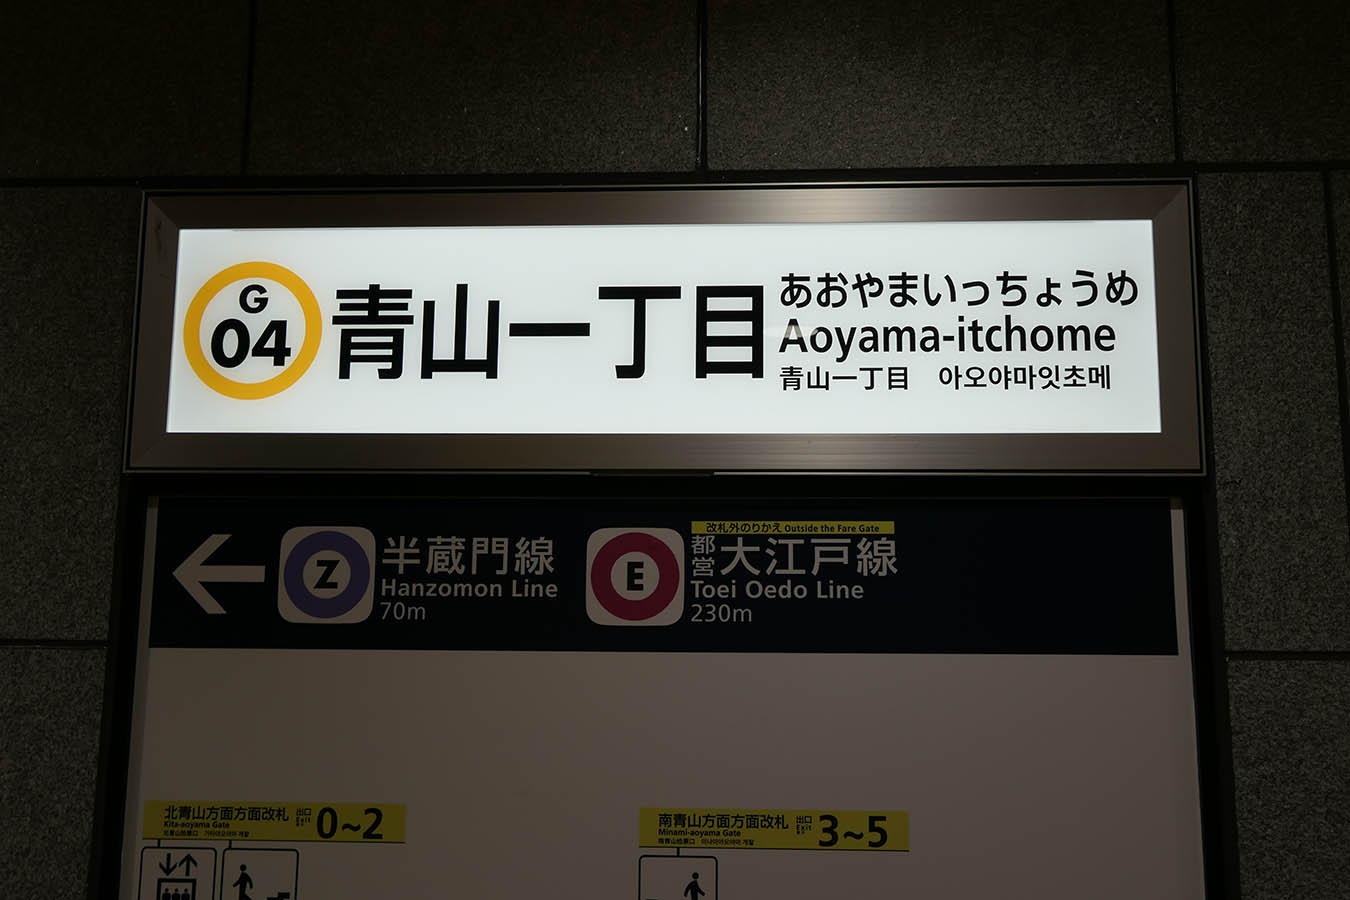 G04_photo05b.jpg